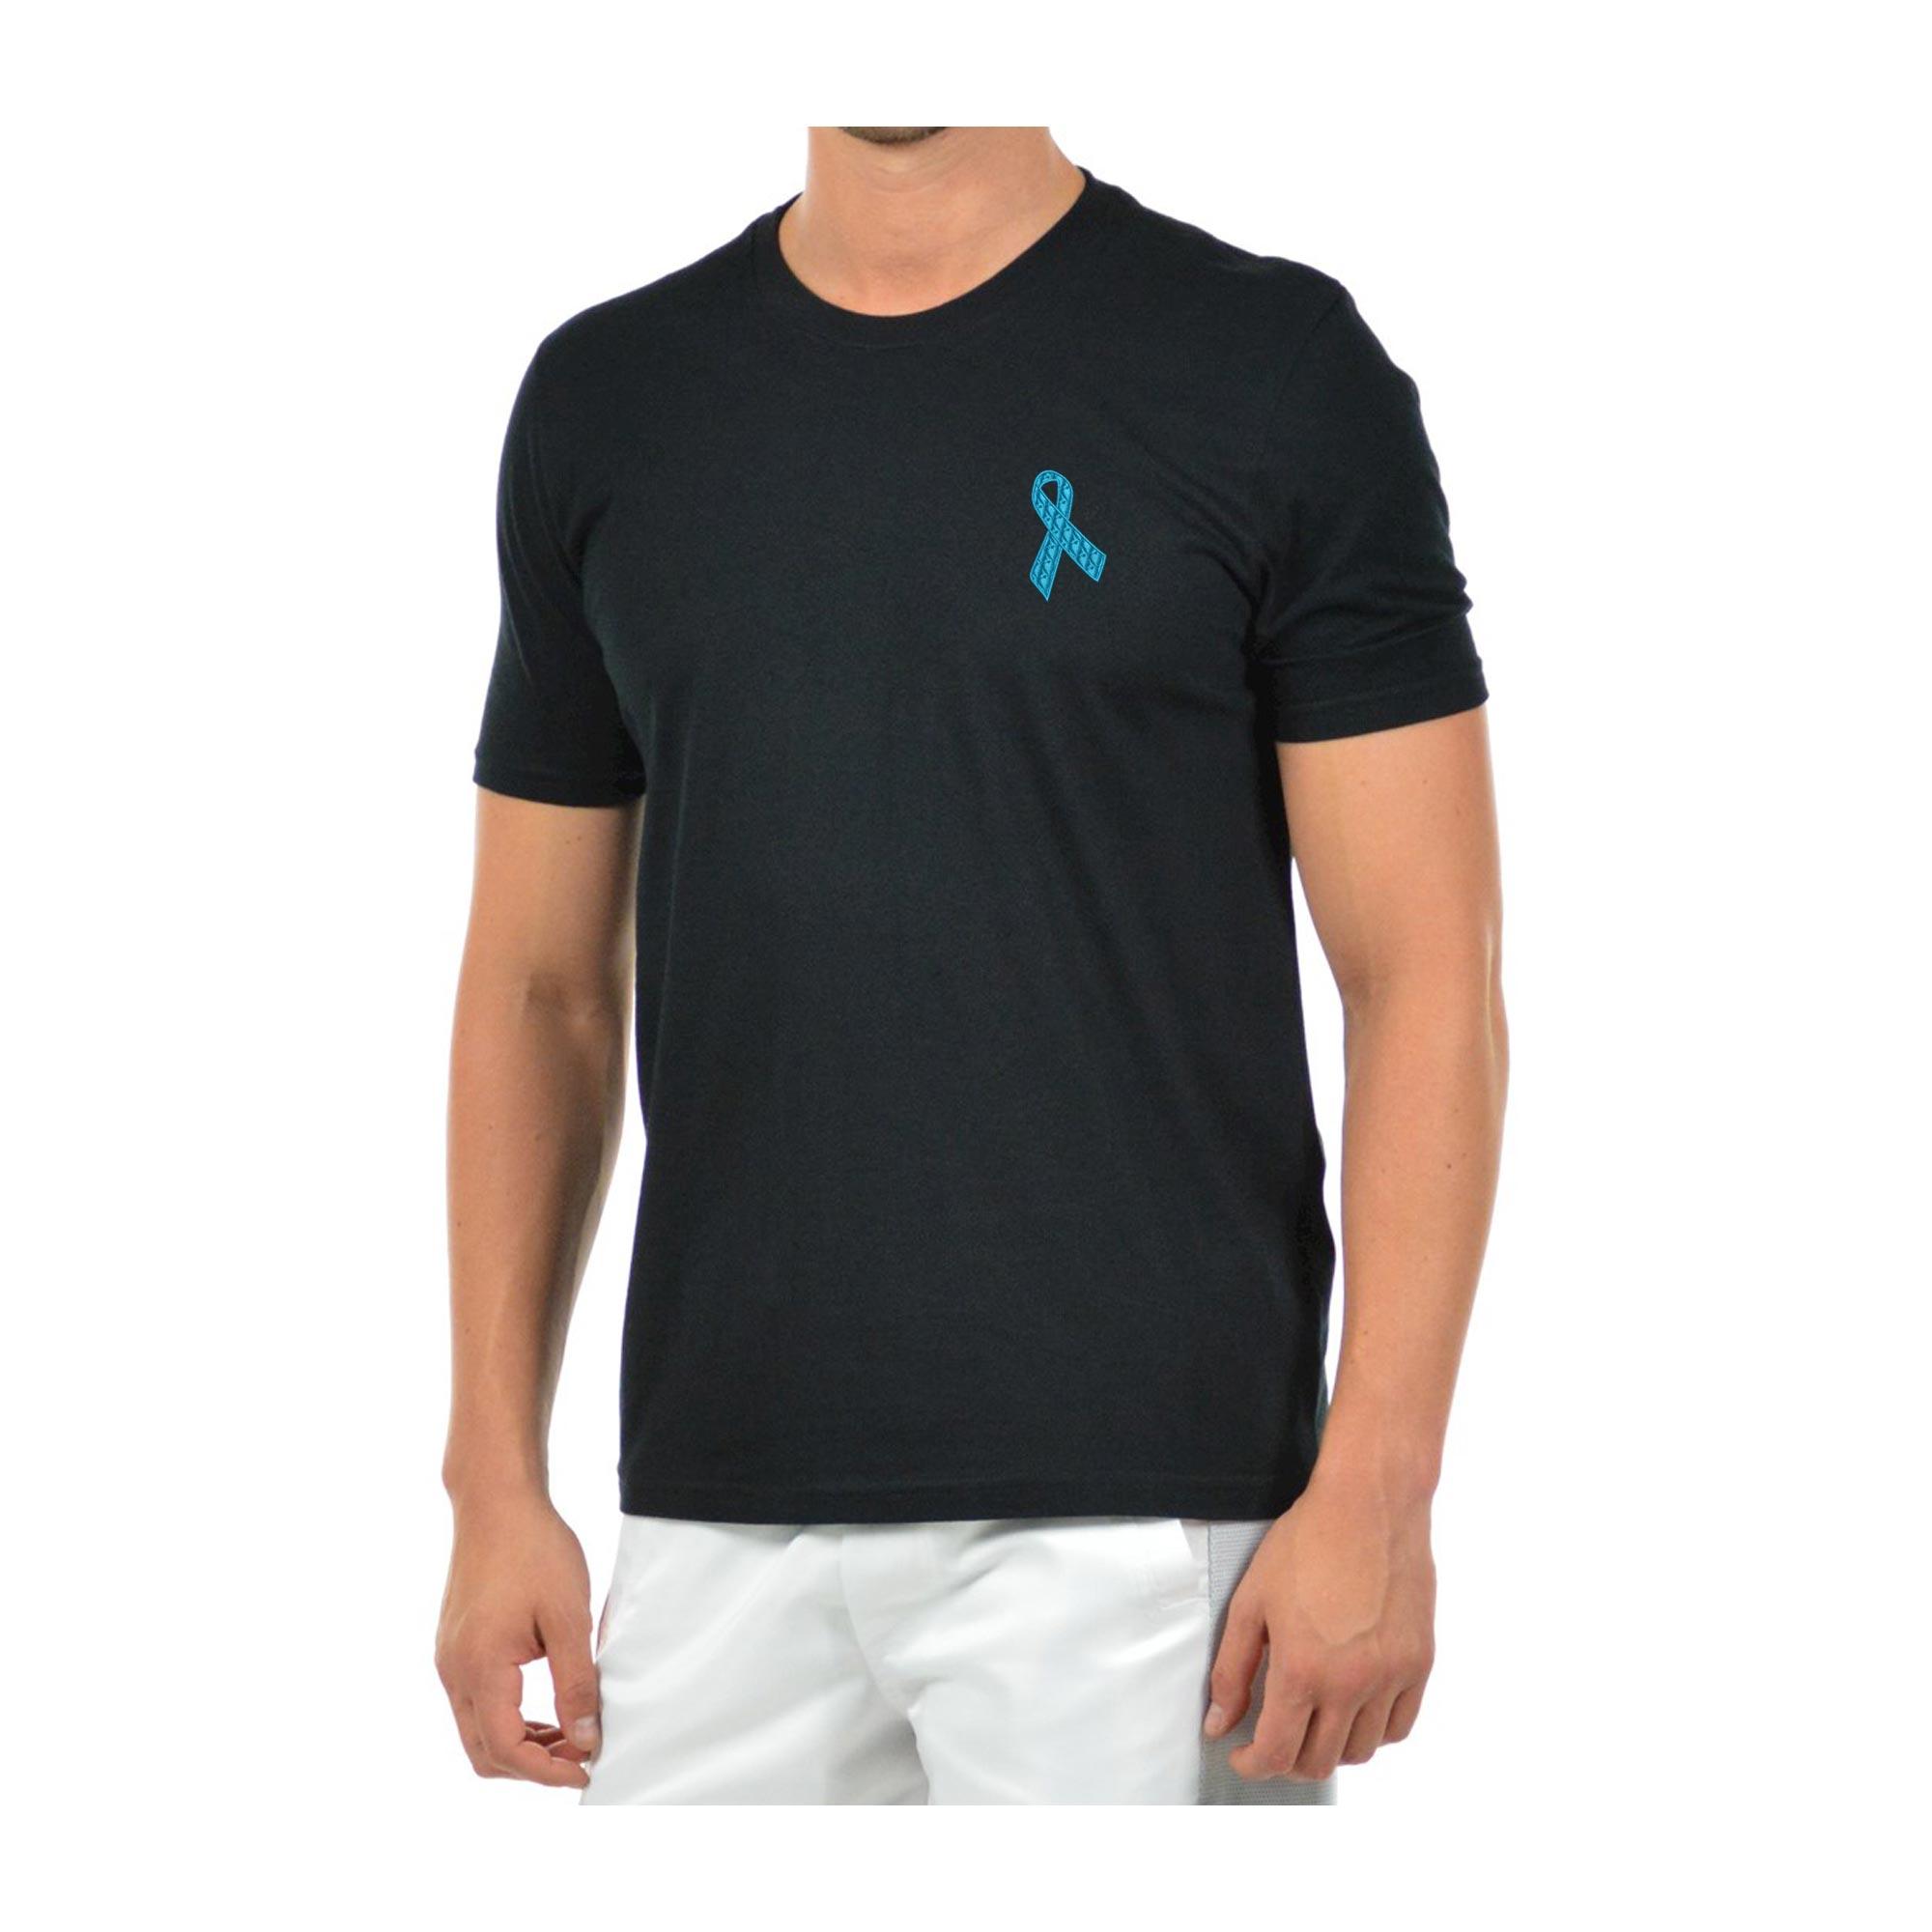 Camiseta Bordada Masculina Laço Novembro Azul Câncer Próstata Heróis do Bem  - Talysmã Bordados